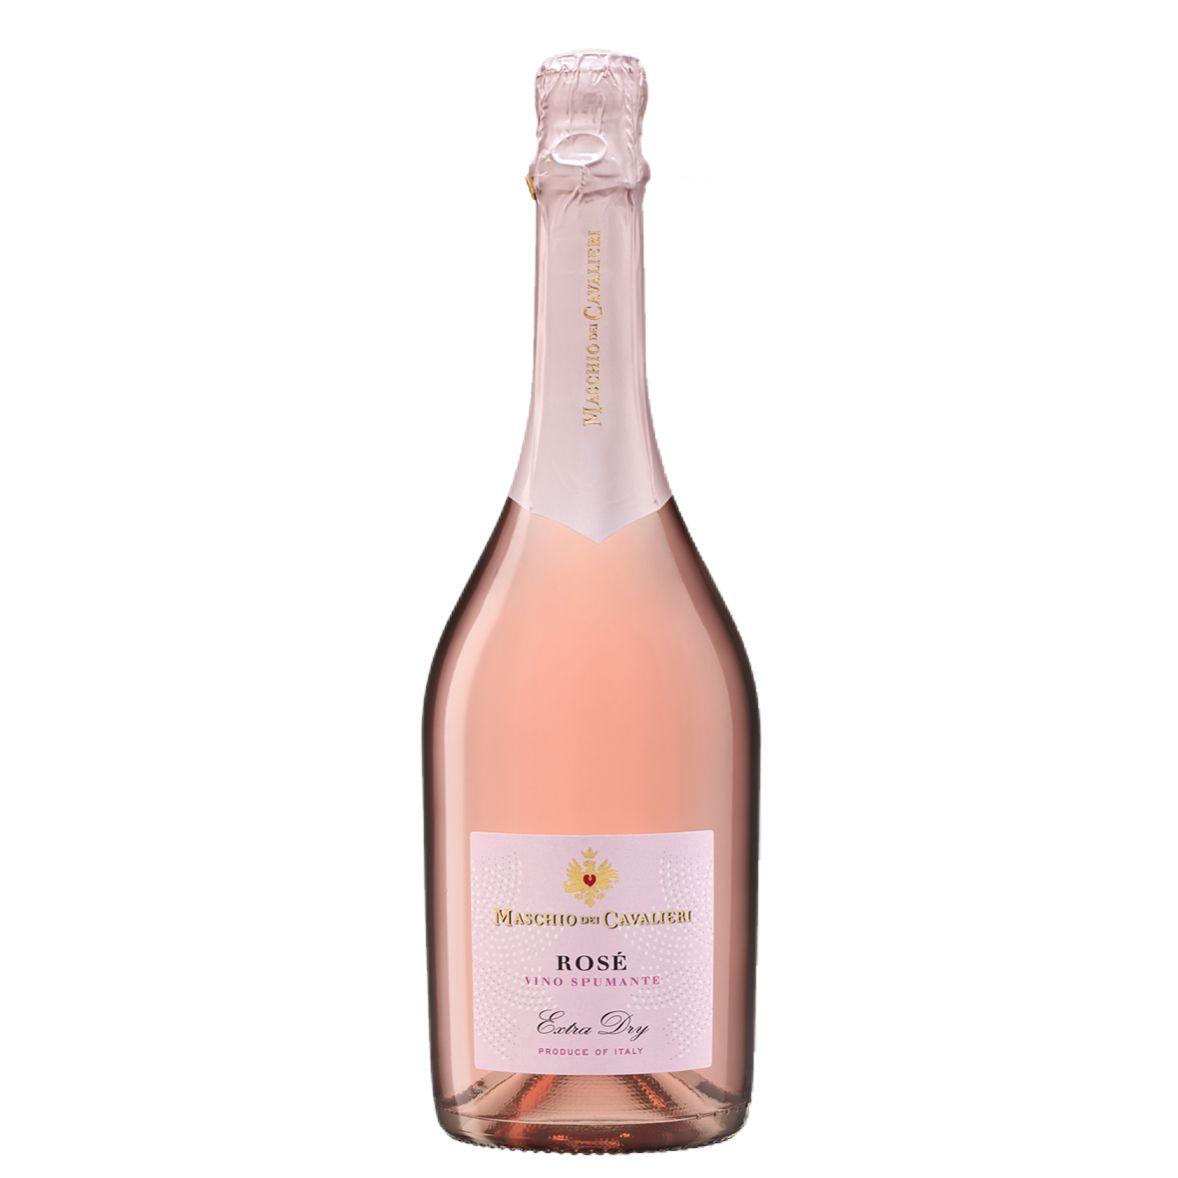 Maschio dei Cavalieri Extra Dry Rosé